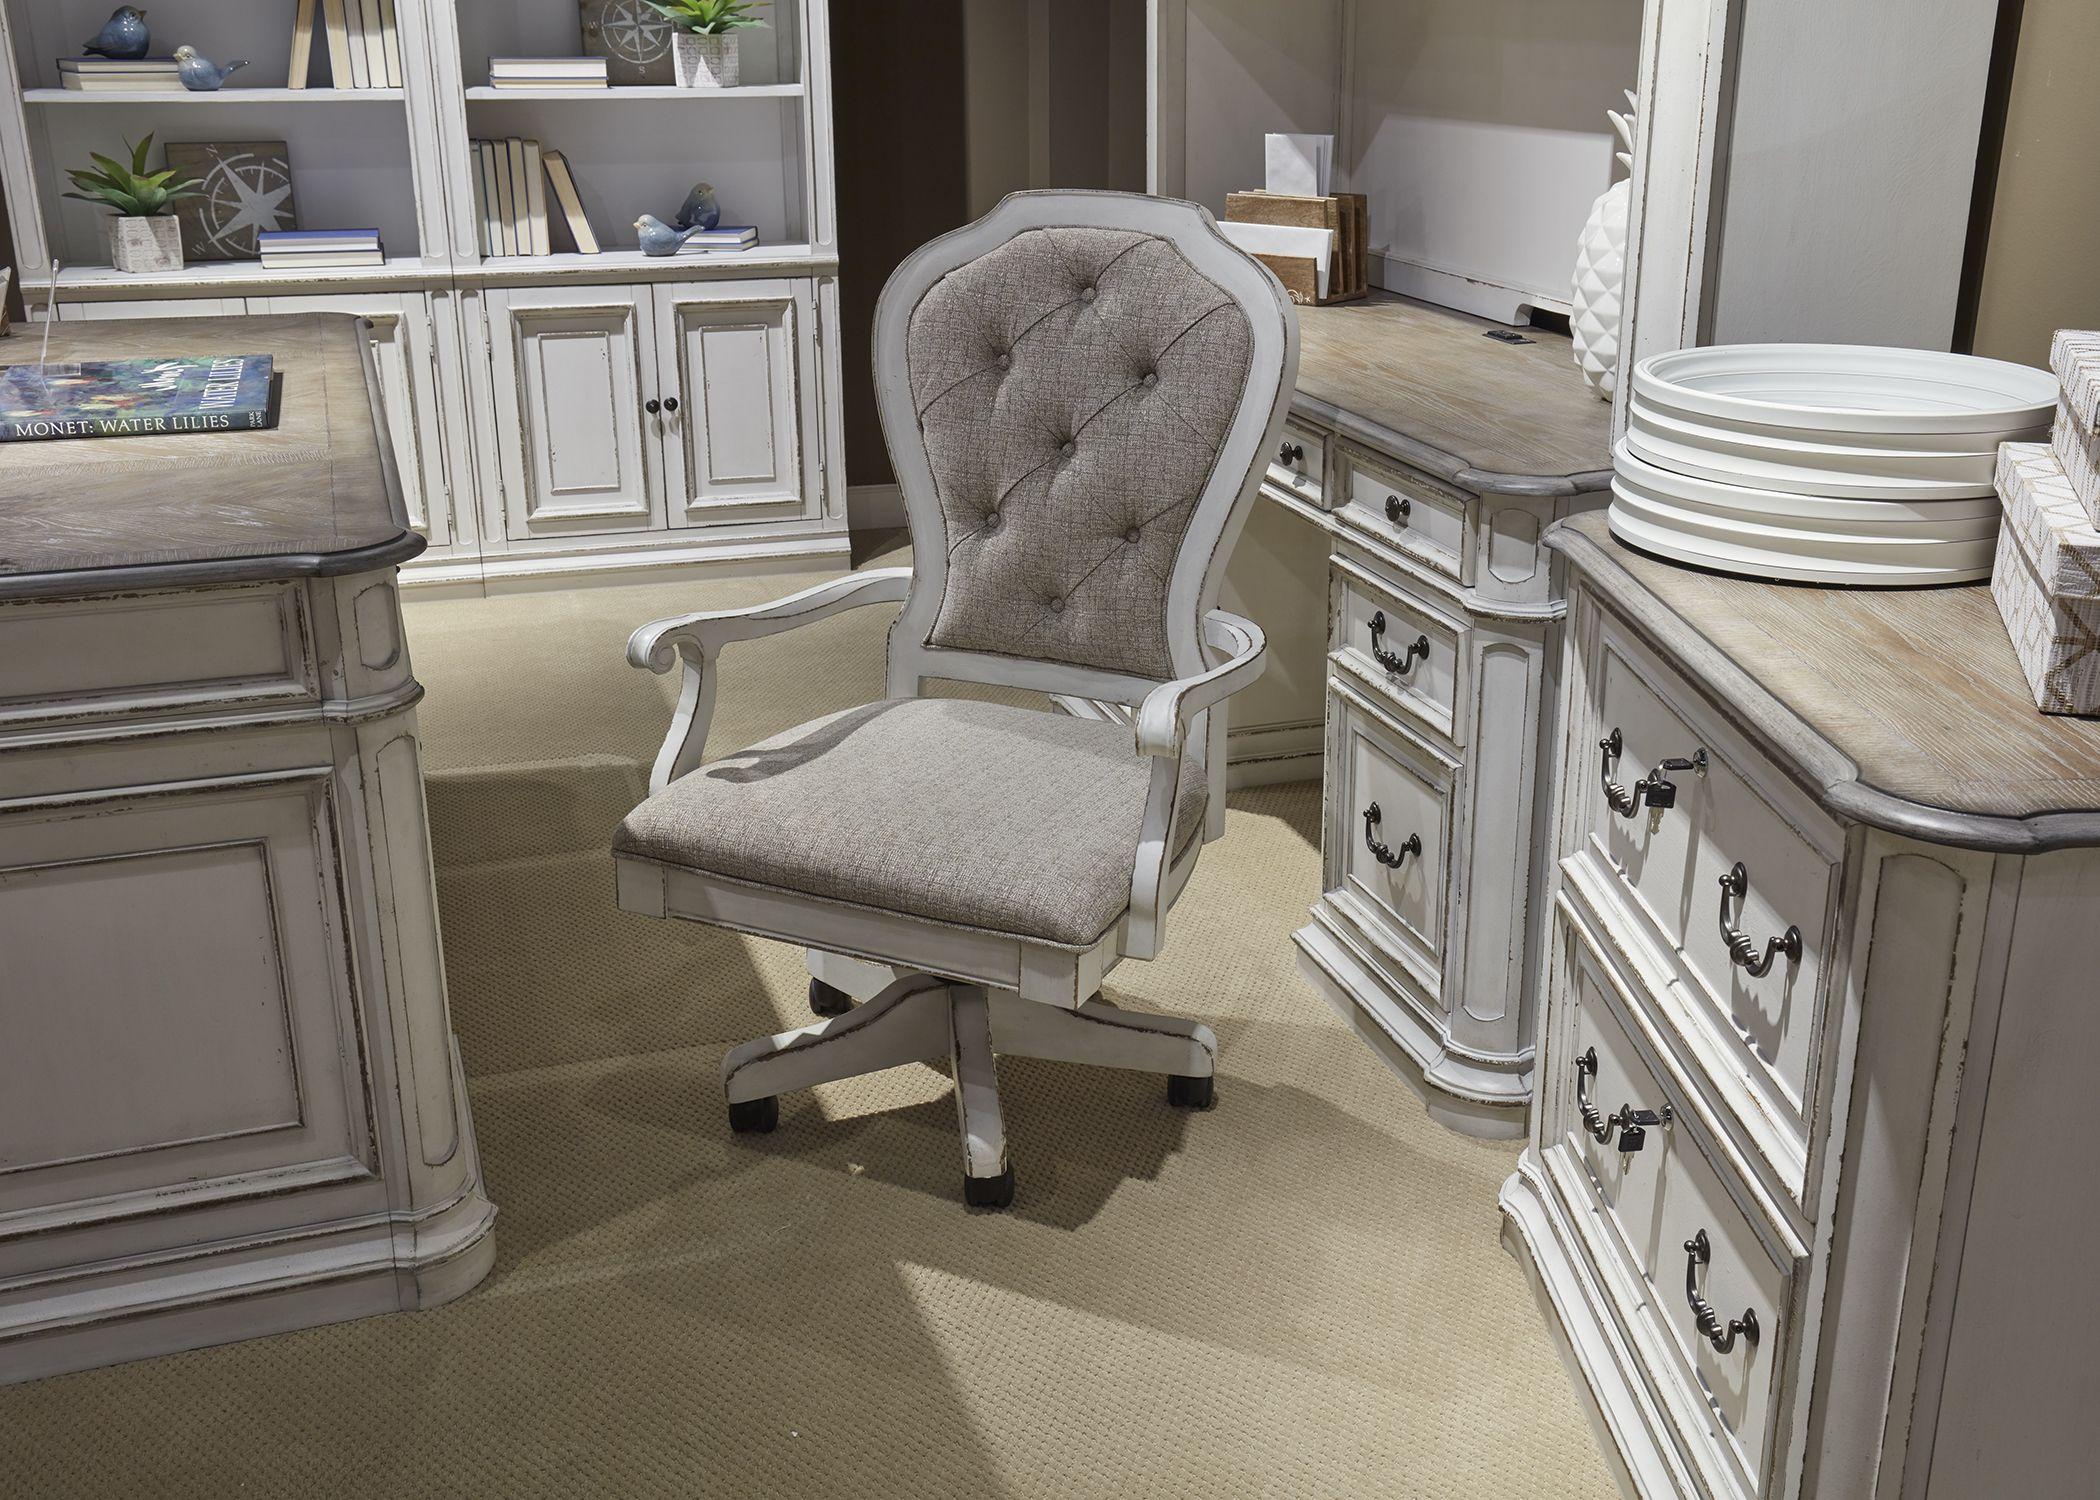 Magnolia Manor Antique White Jr Executive Desk ChairMedia Image